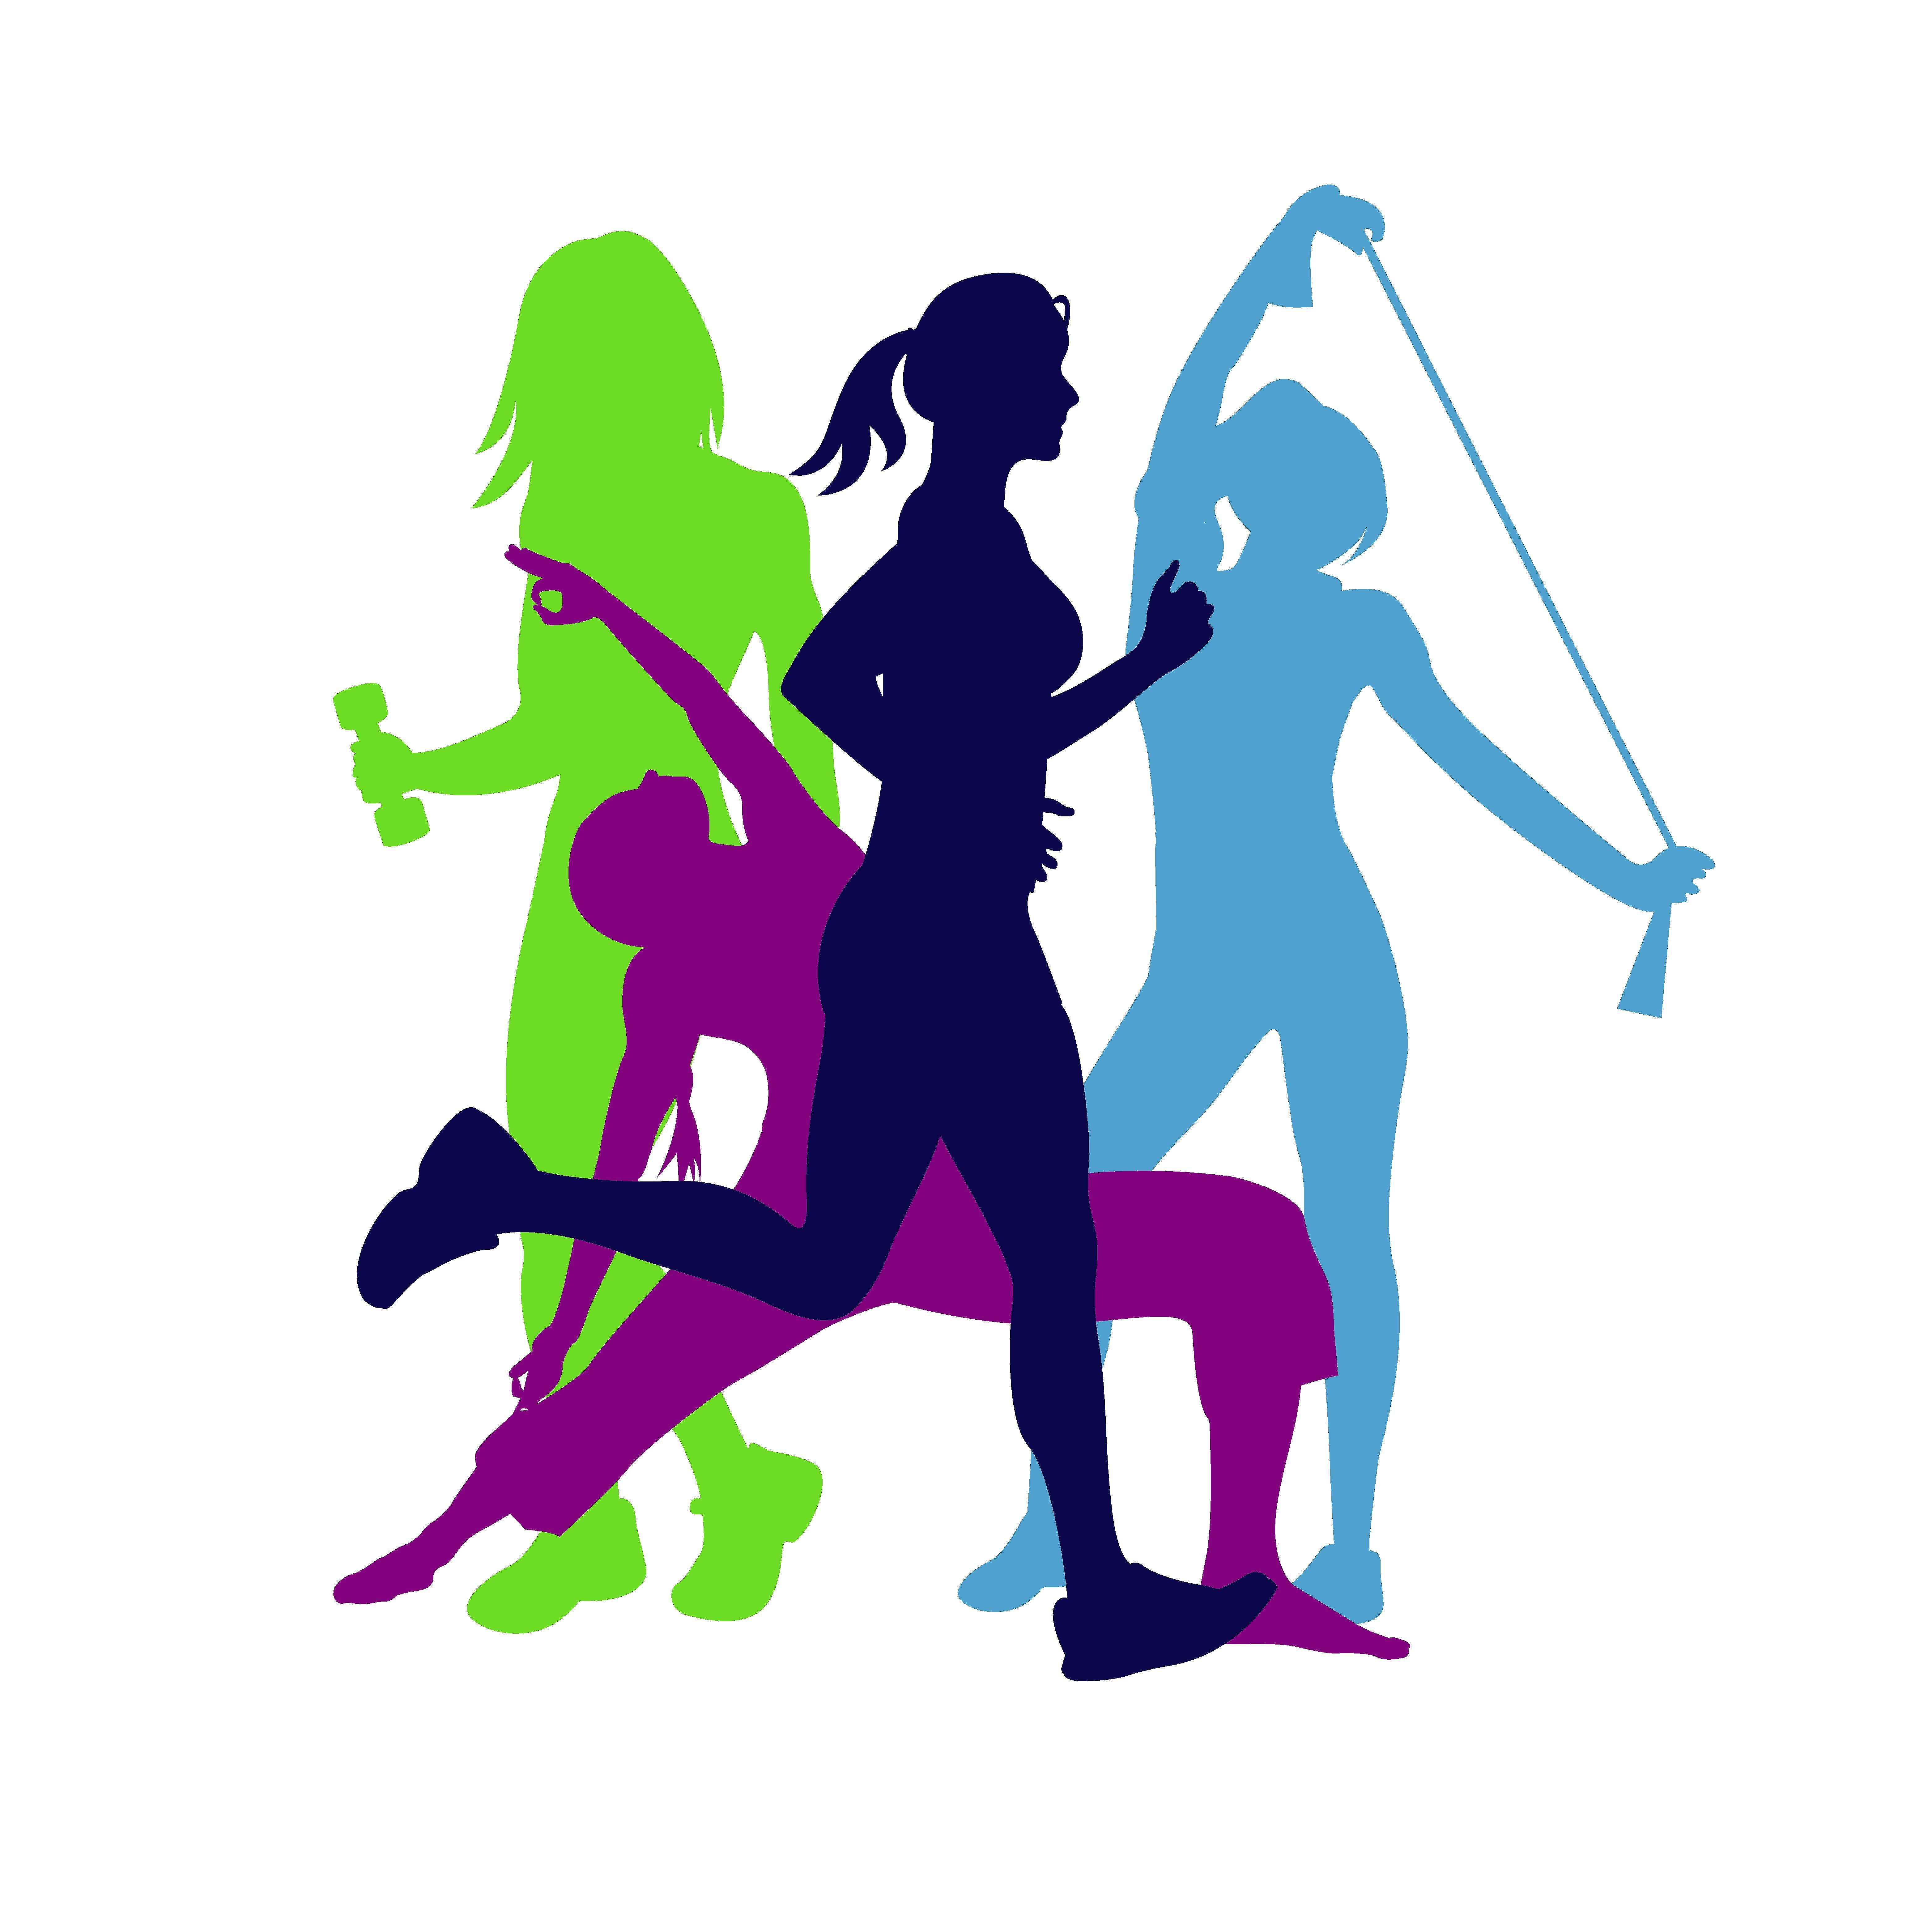 Fitness Emblem Woman Silhouette Gym Art Fitness Art Woman Silhouette